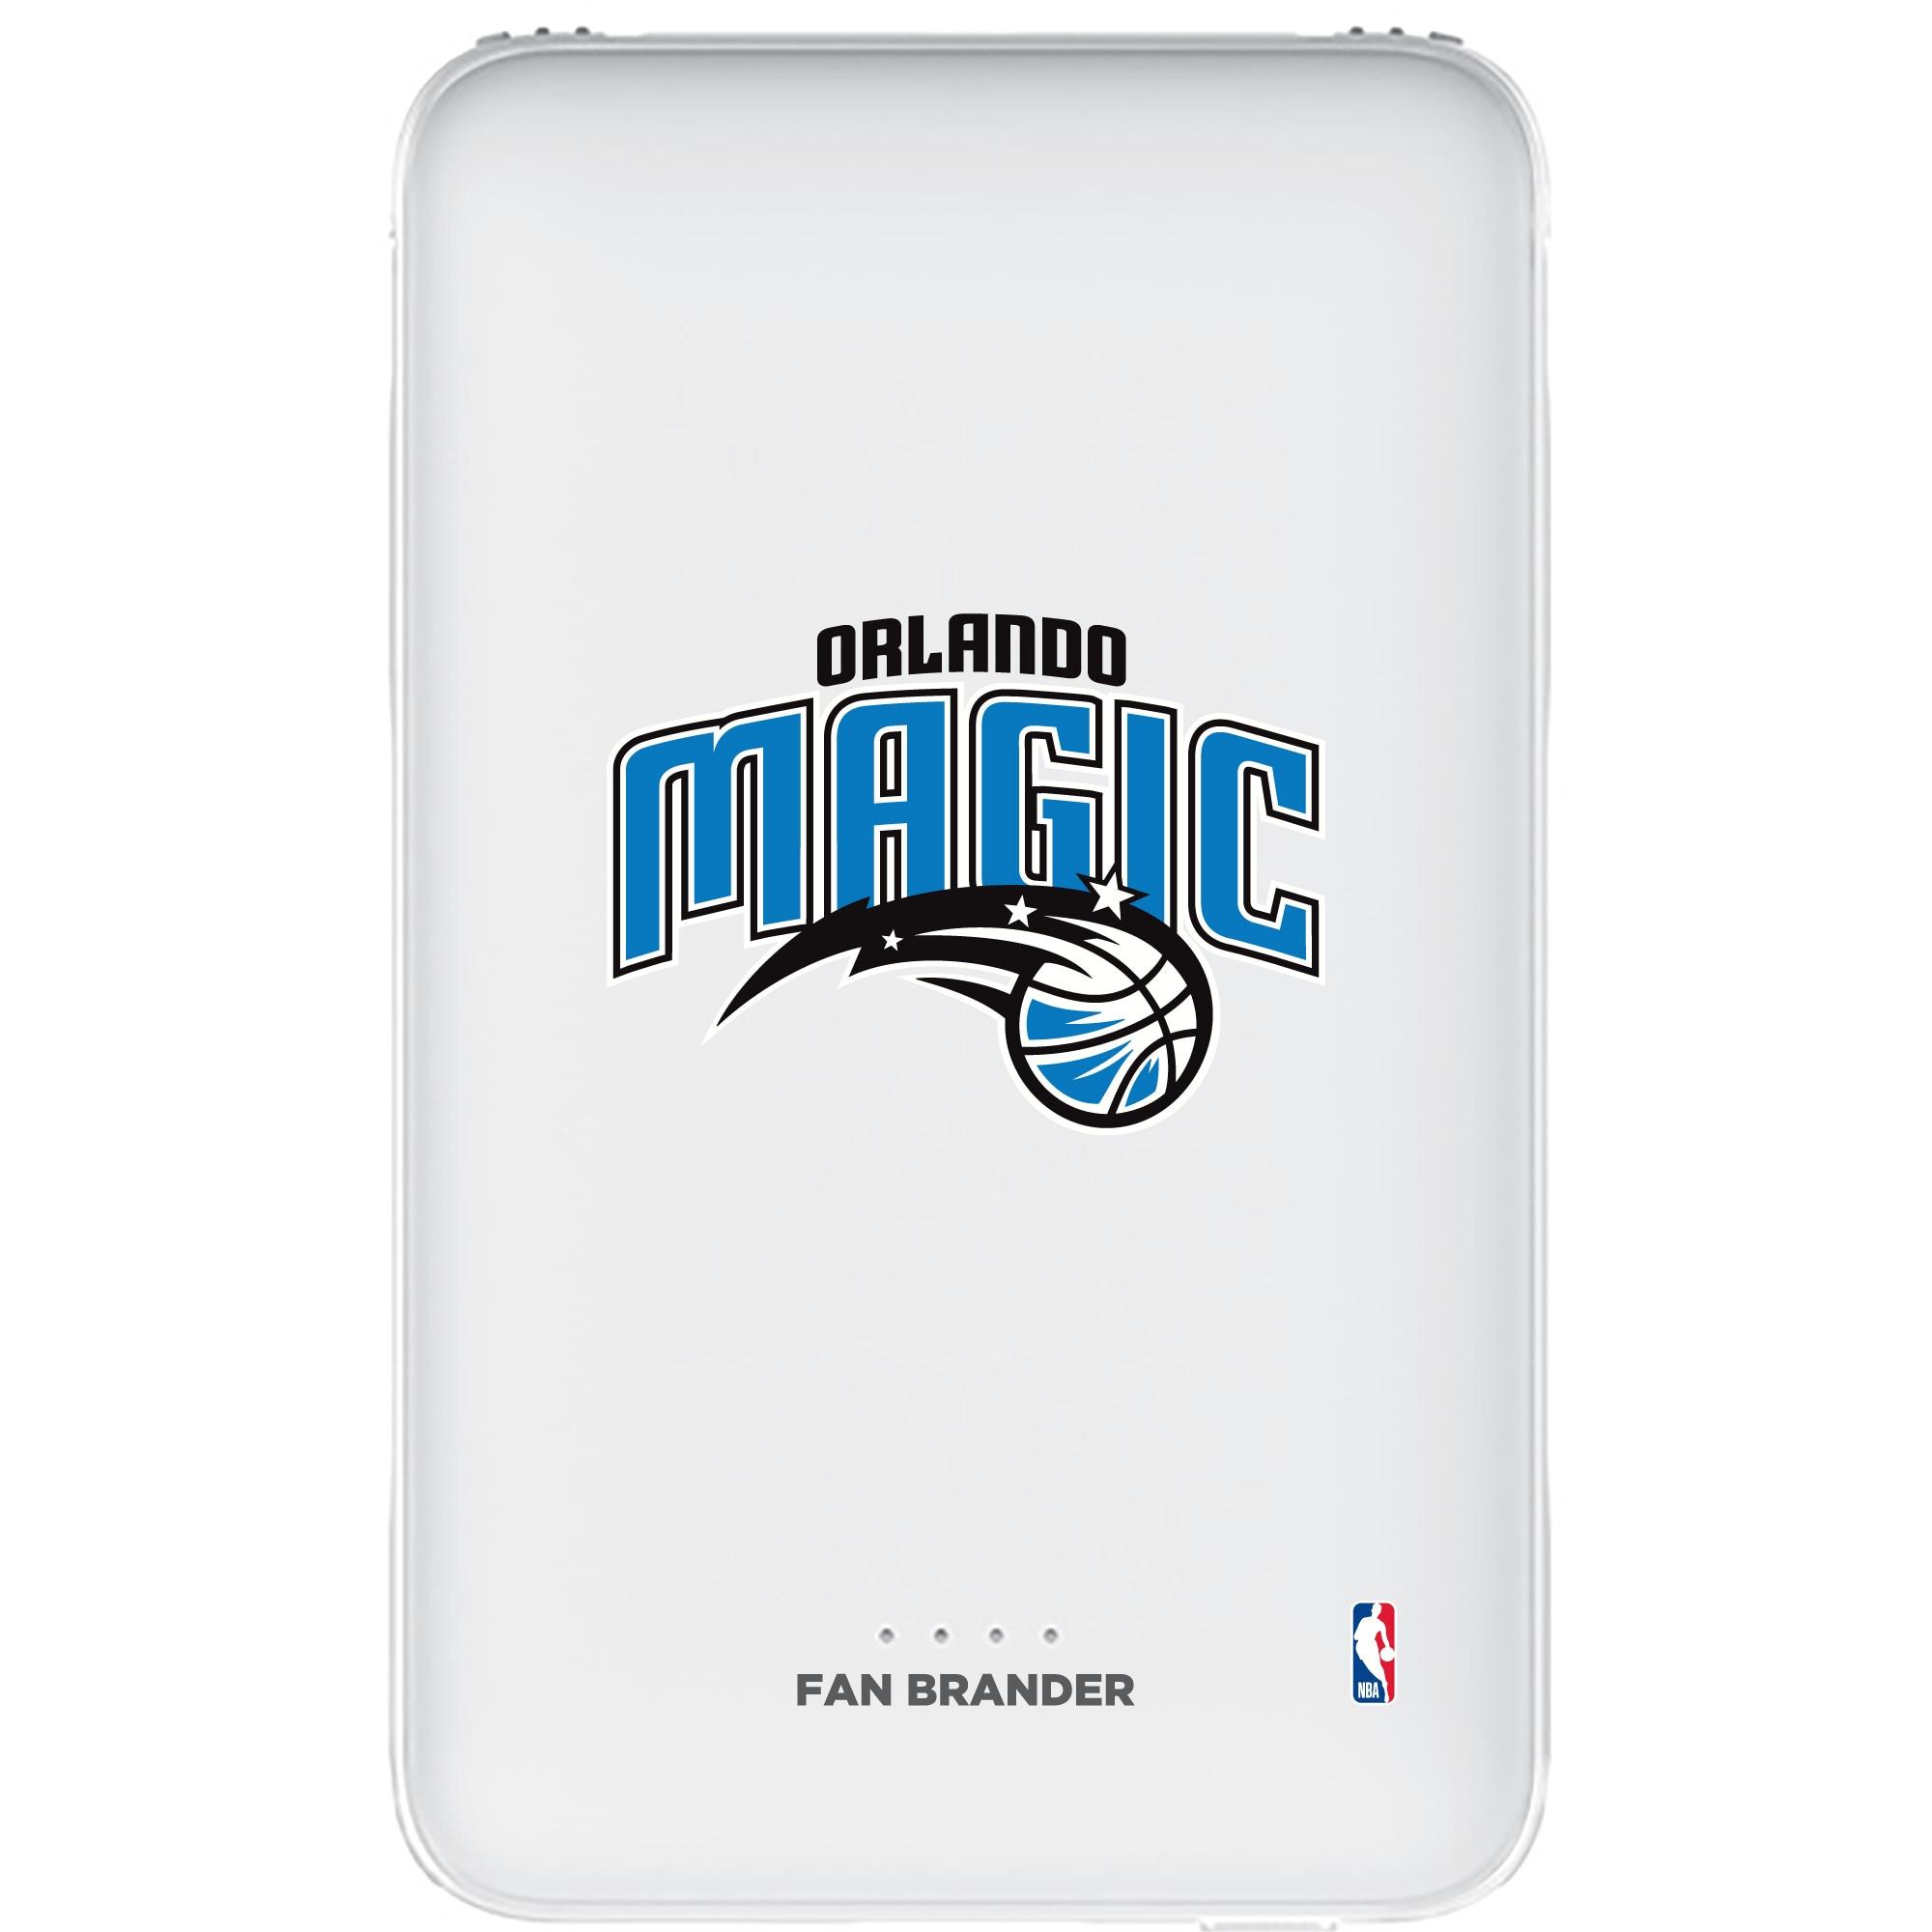 Orlando Magic 5000mAh Portable Power Bank - White